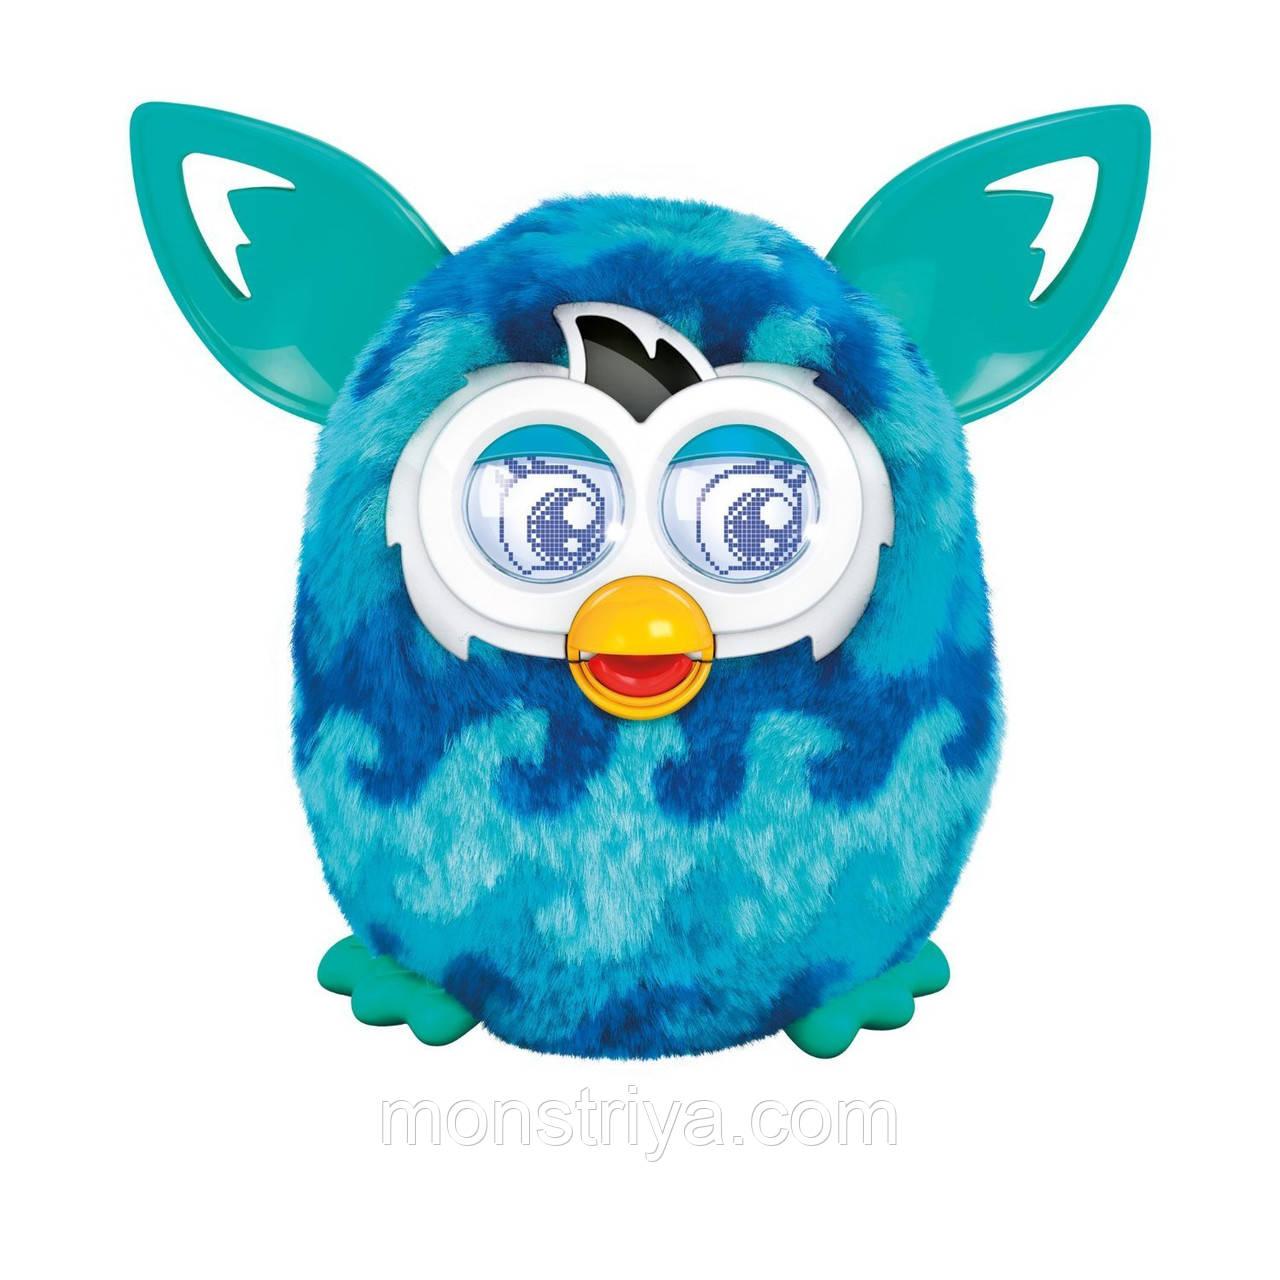 Ферби бум Furby-Boom Waves Волна интерактивная игрушка